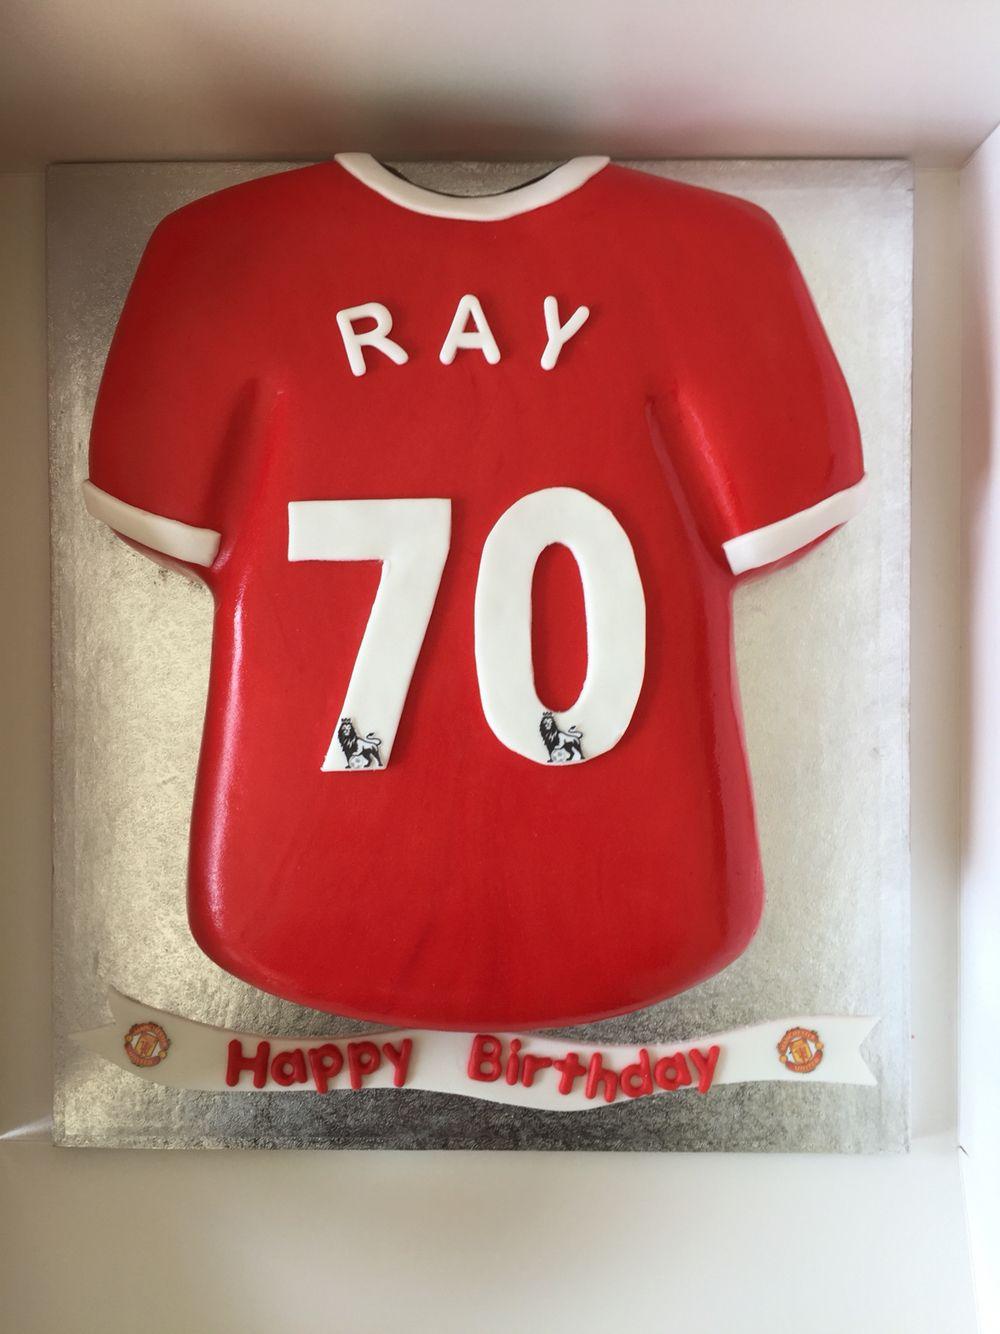 Manchester United 70th Cake Shirt Cake Manchester United T Shirts Manchester United Shirt